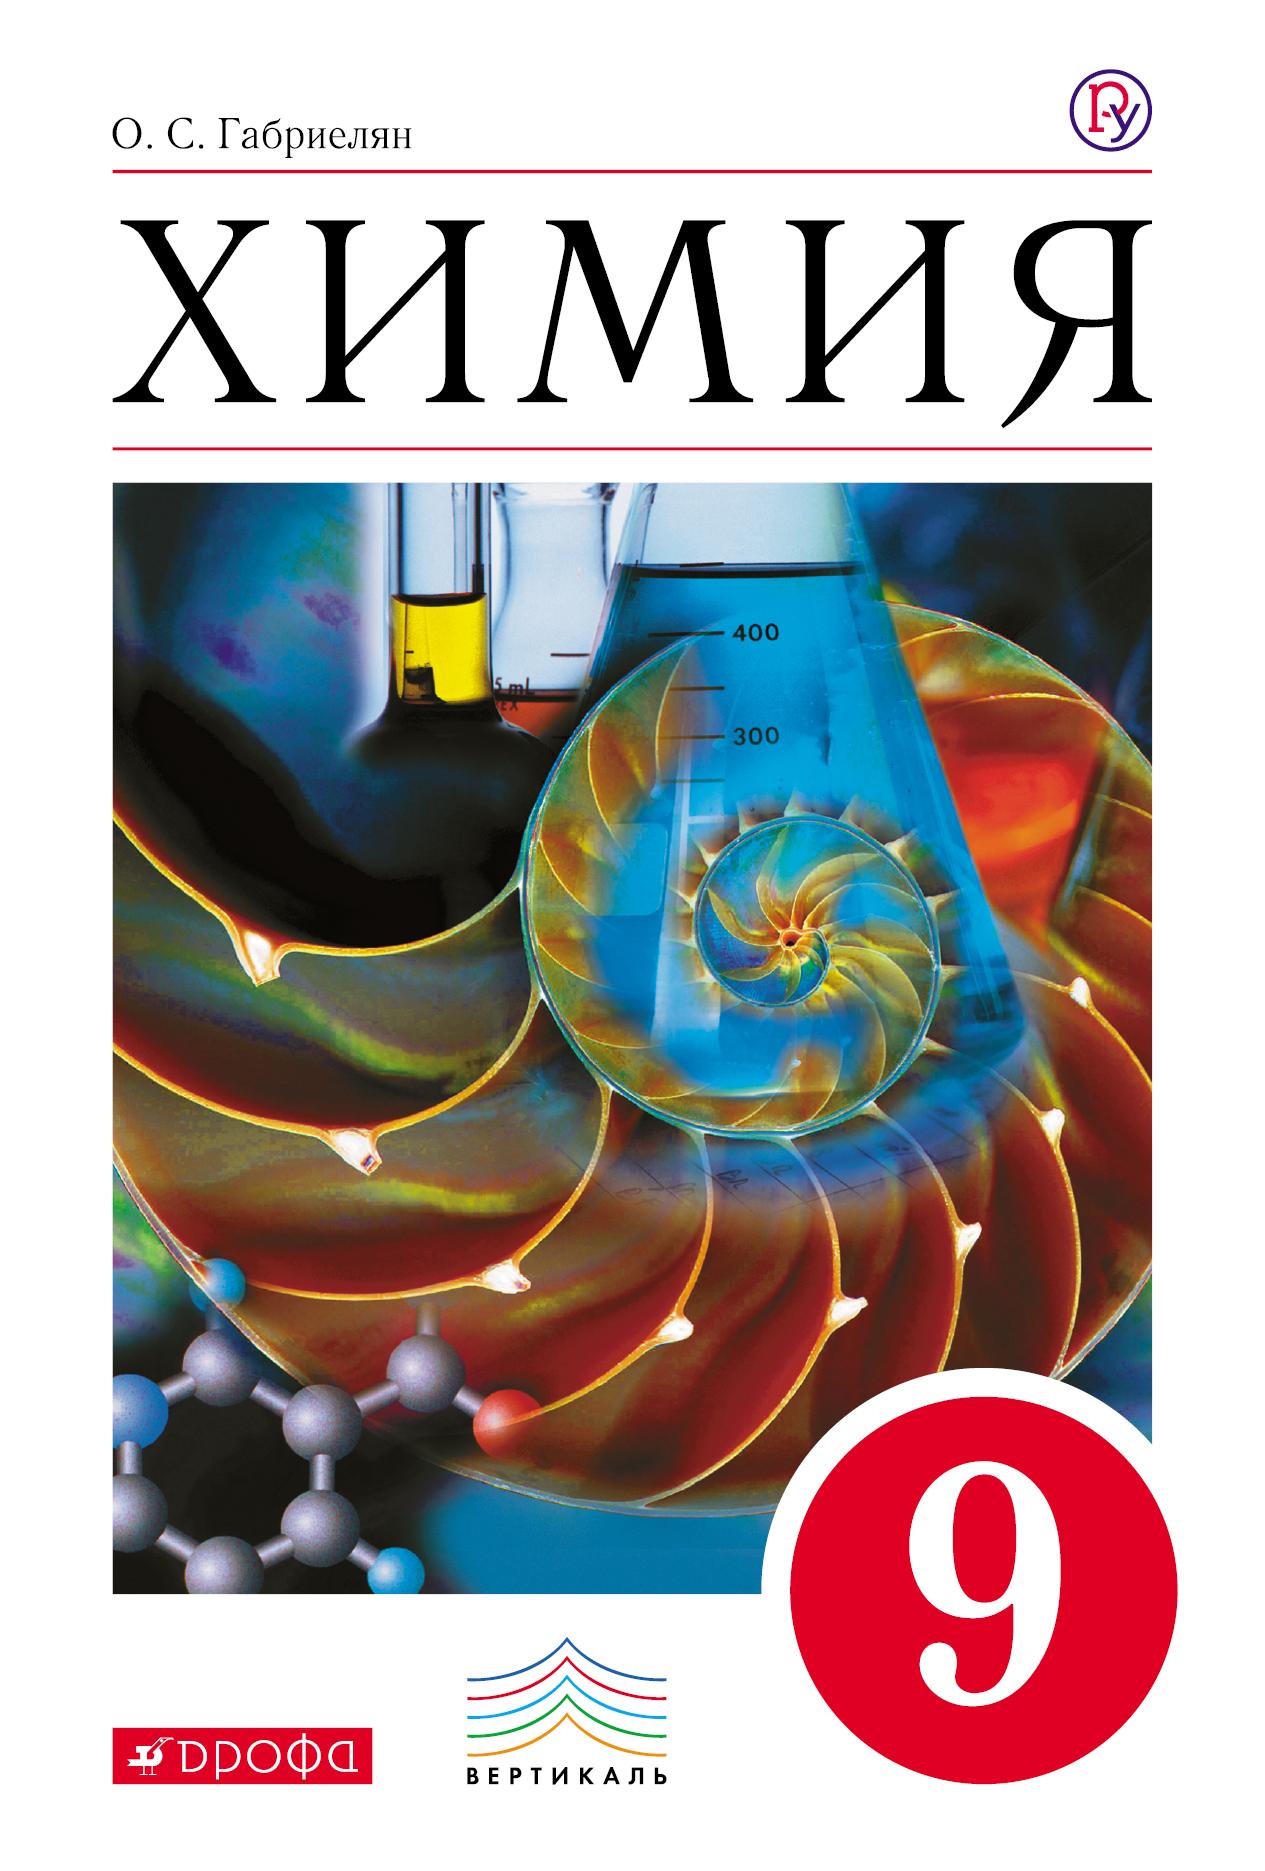 цена на Габриелян О.С. Химия. 9 класс. Учебник